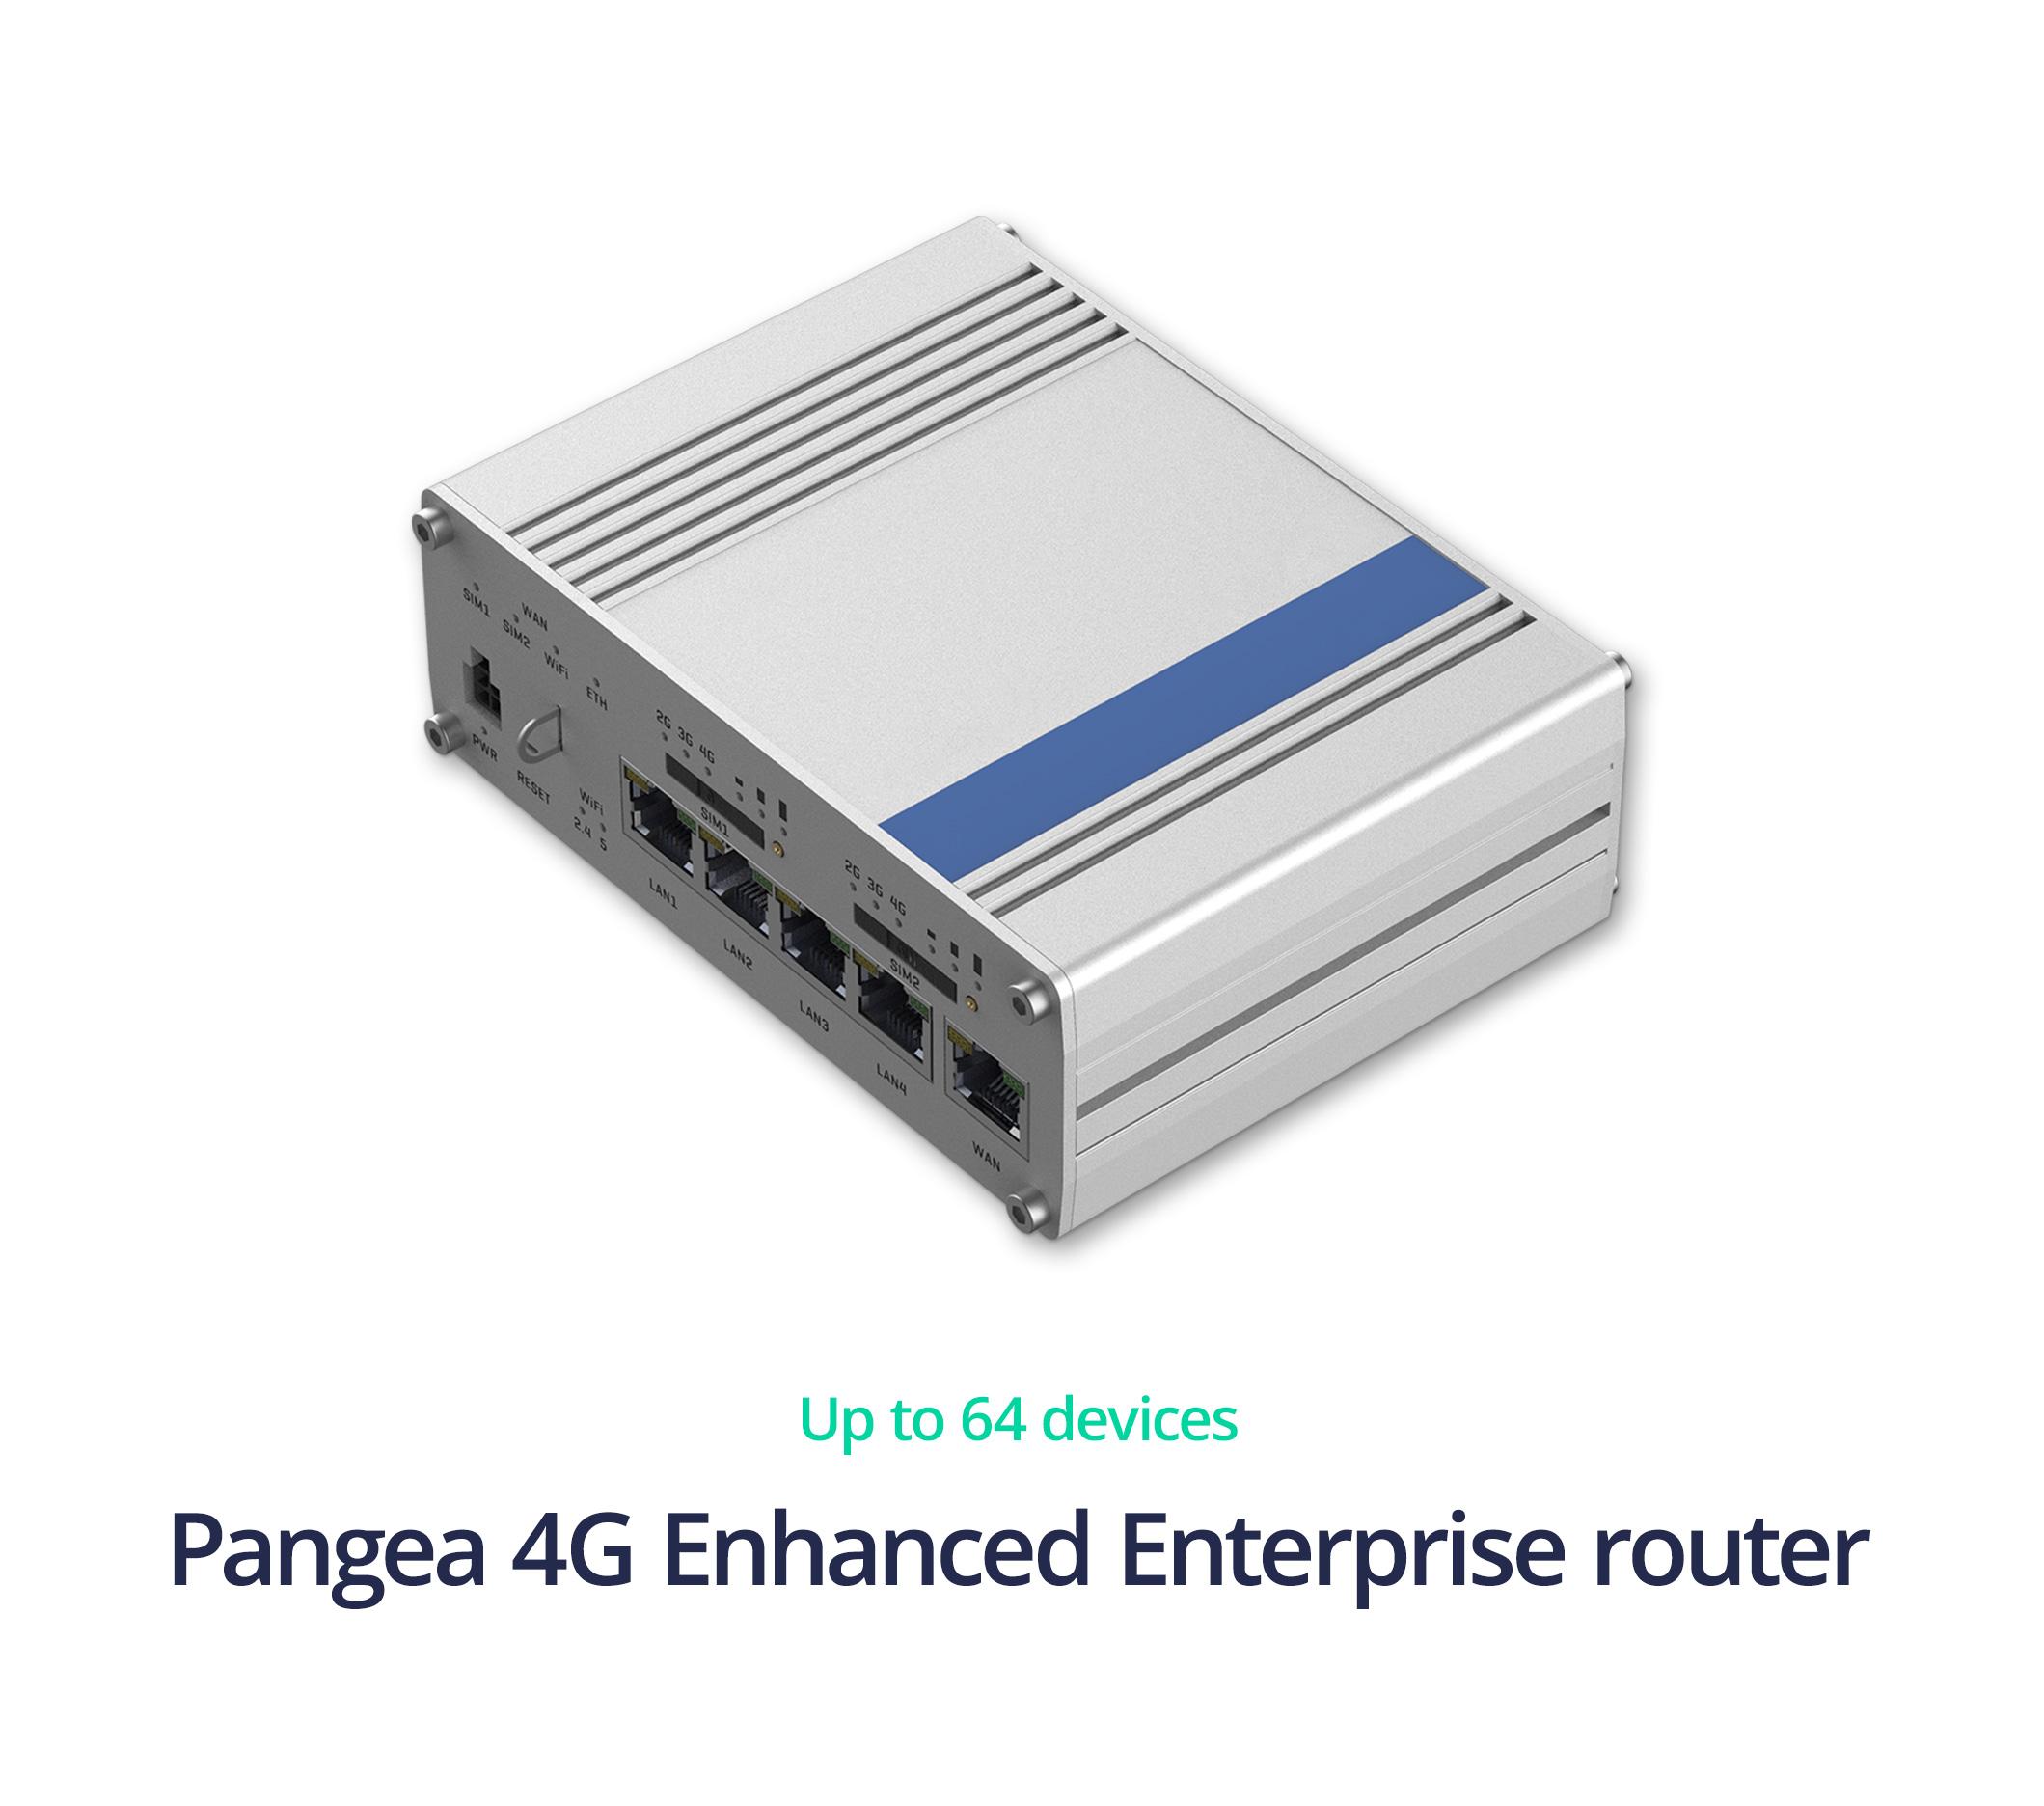 Pangea Mi-Fi - Pangea 4G Enhanced Enterprise link